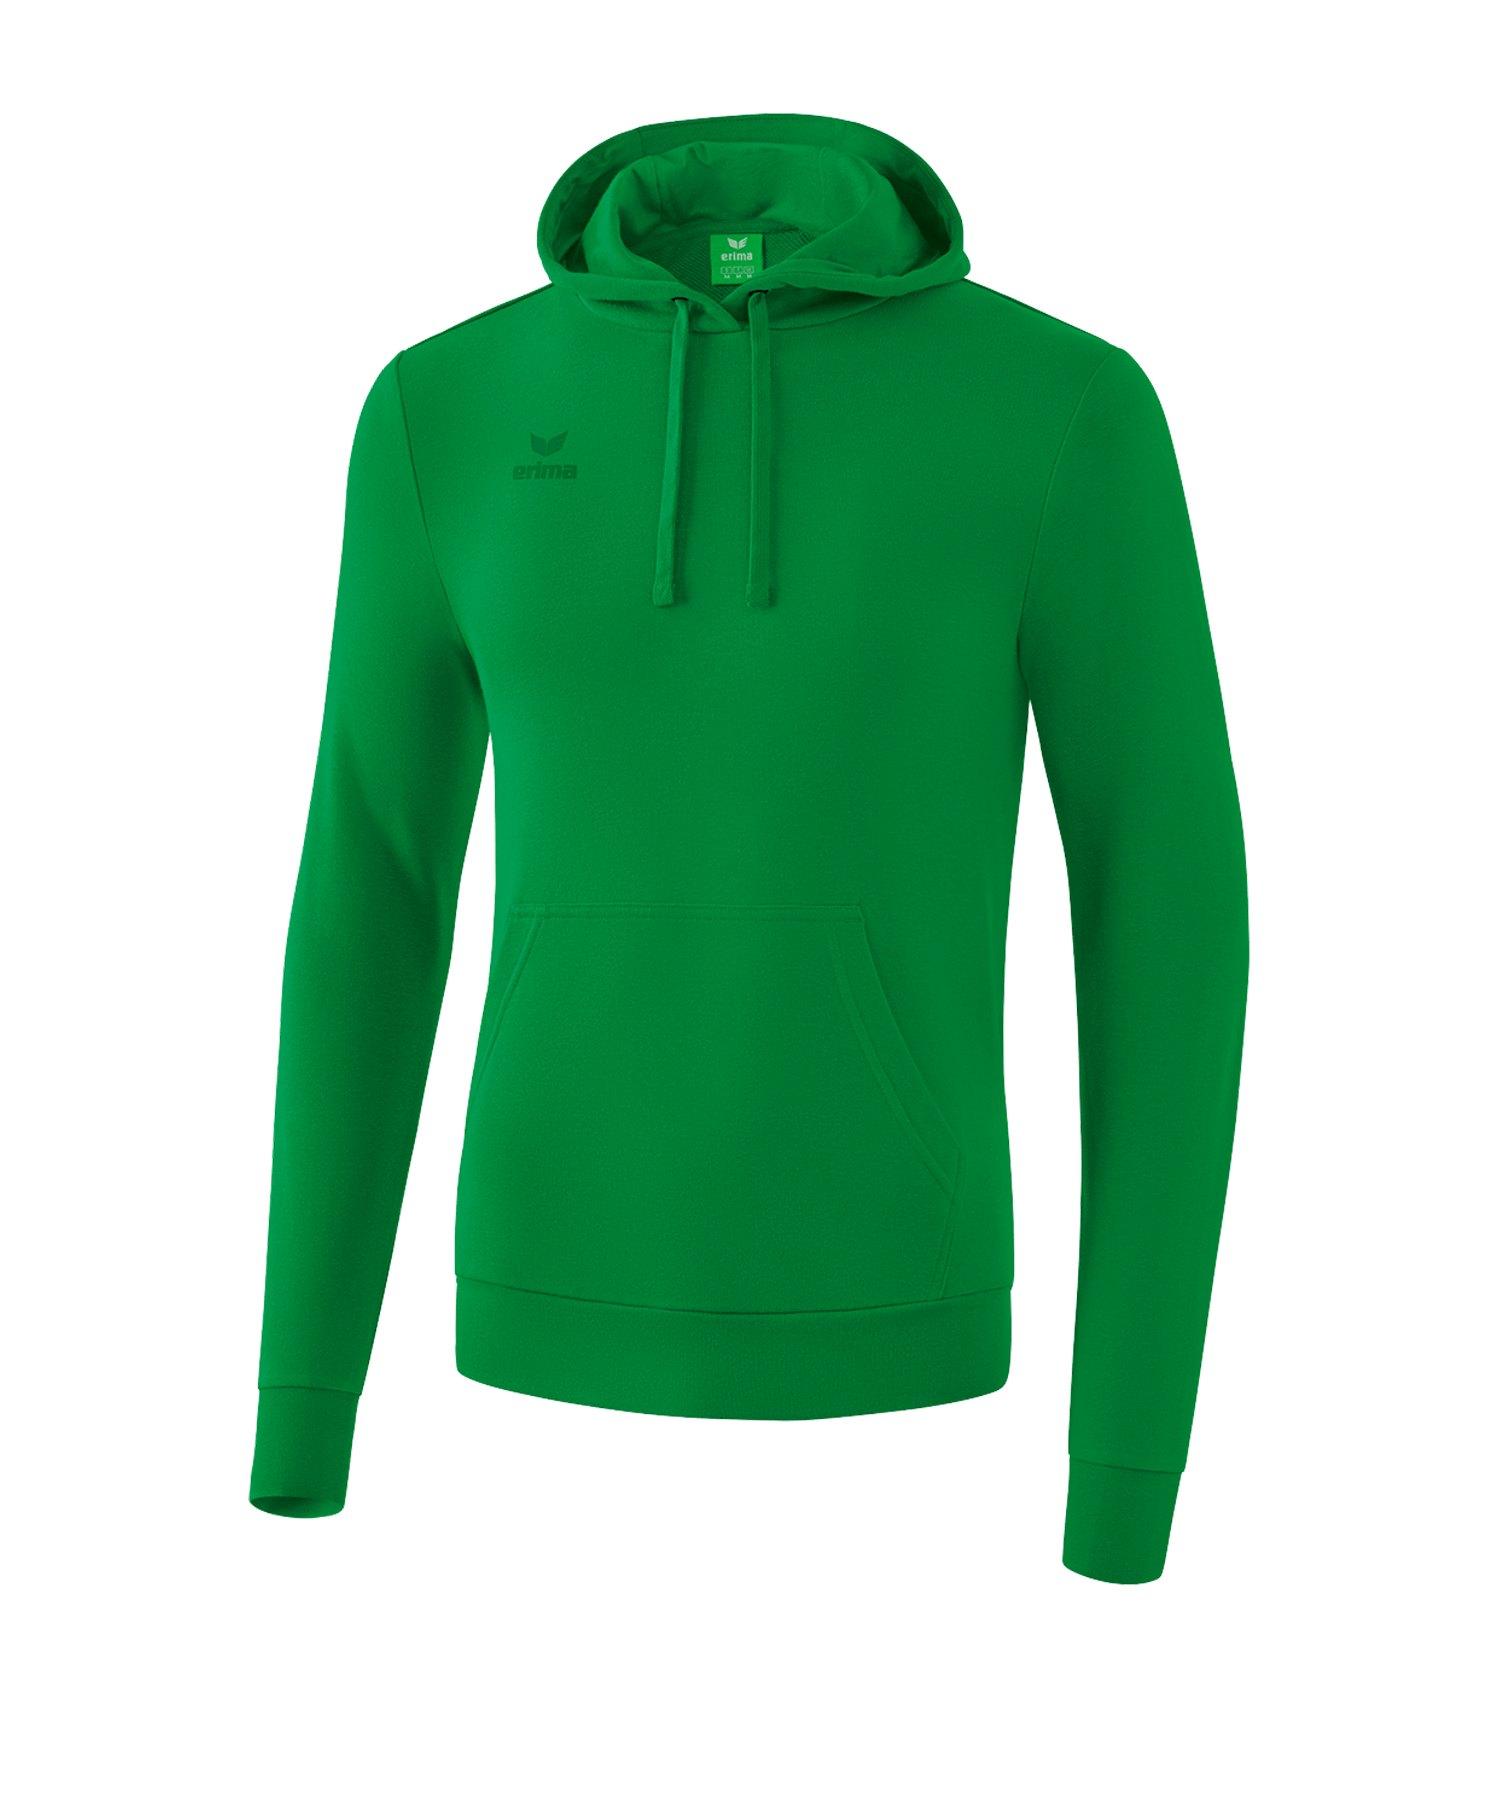 Erima Basic Hoody Grün - gruen